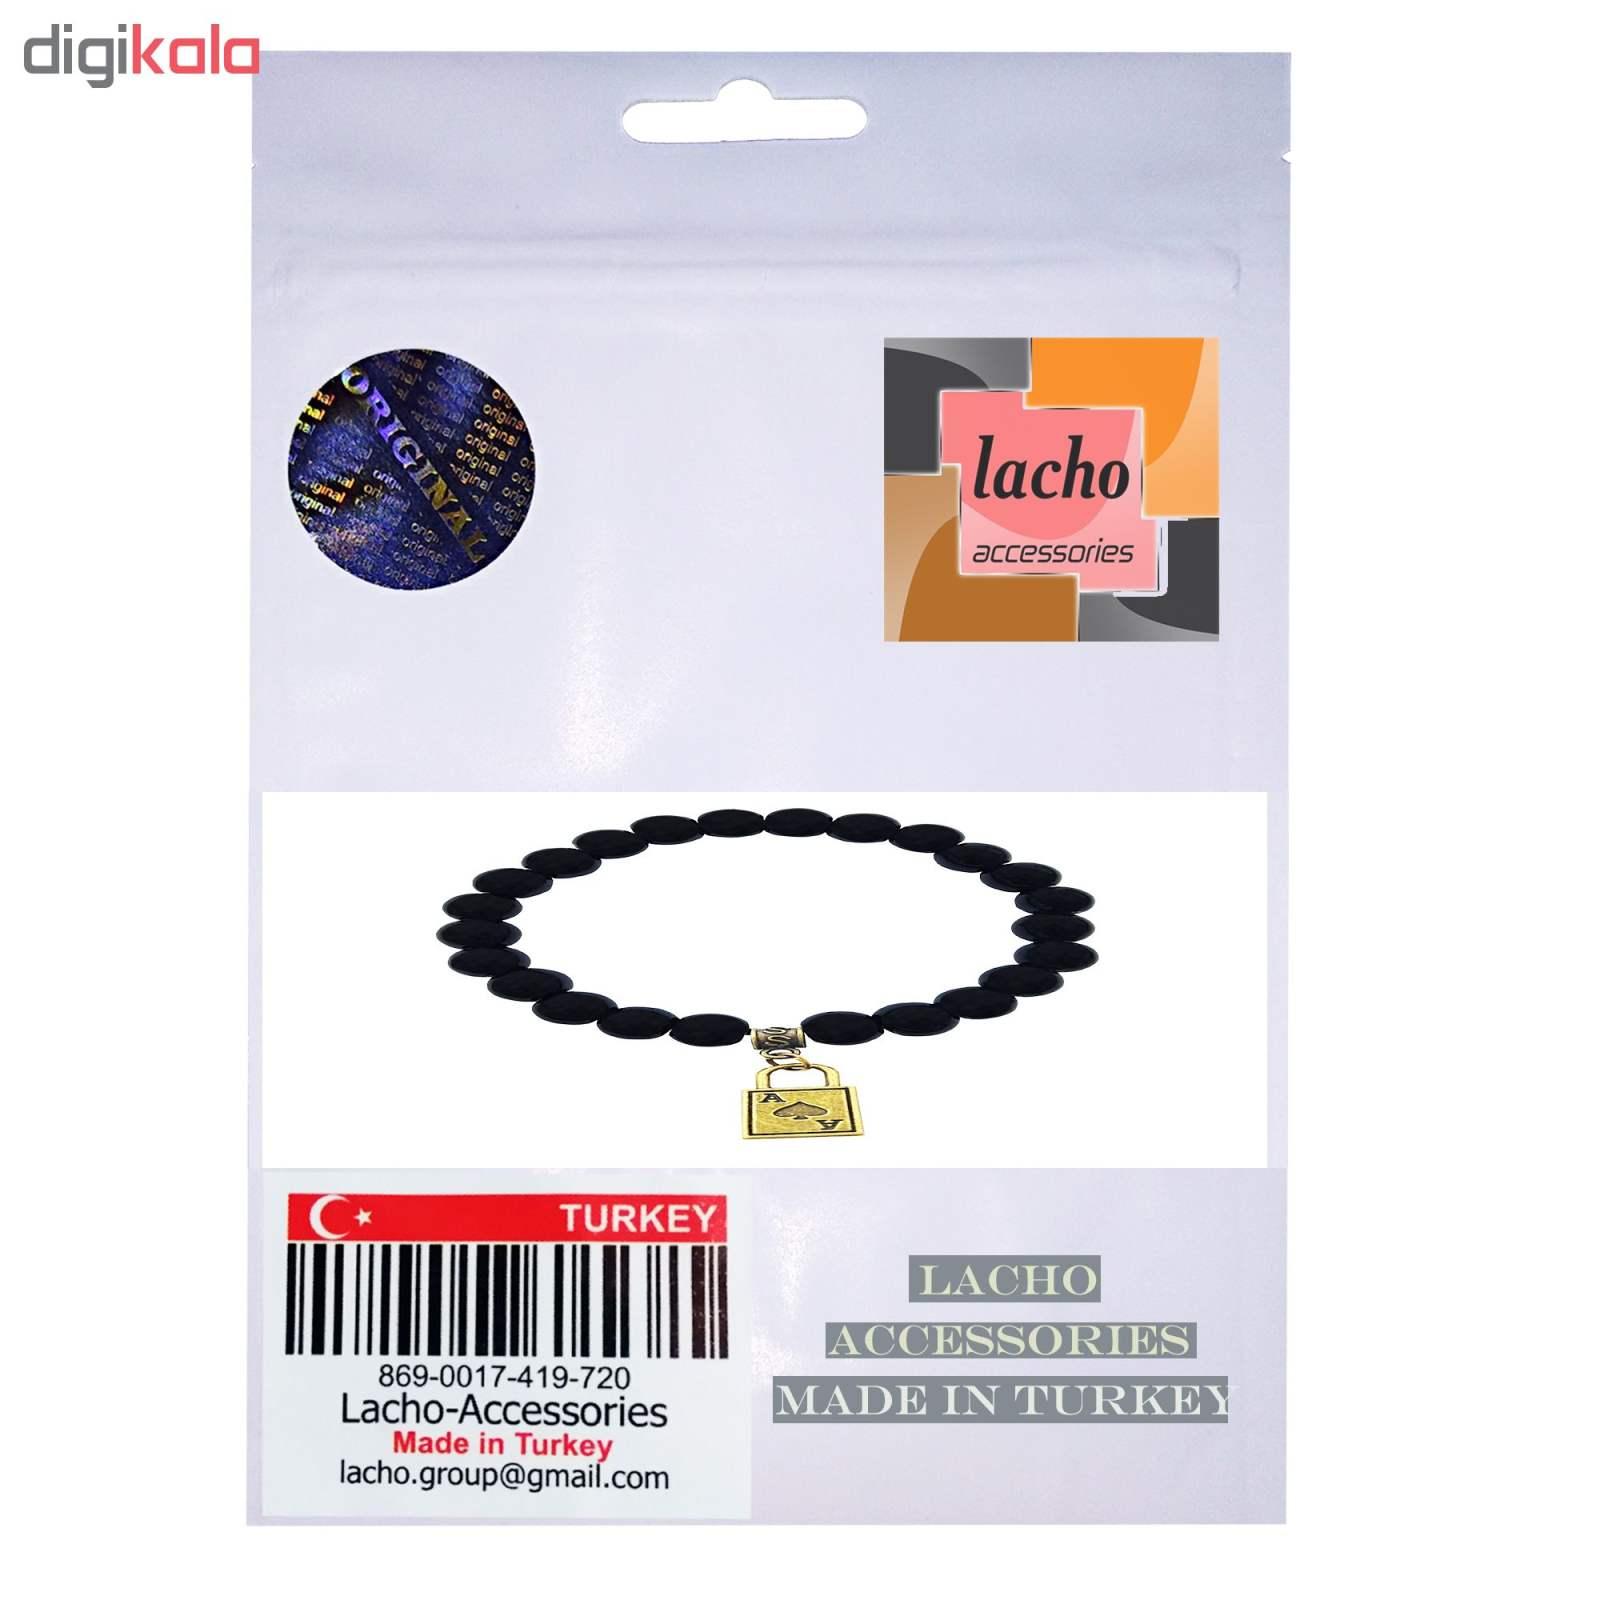 دستبند زنانه لاچو طرح قفل کد 2019 سایز Free Size main 1 3